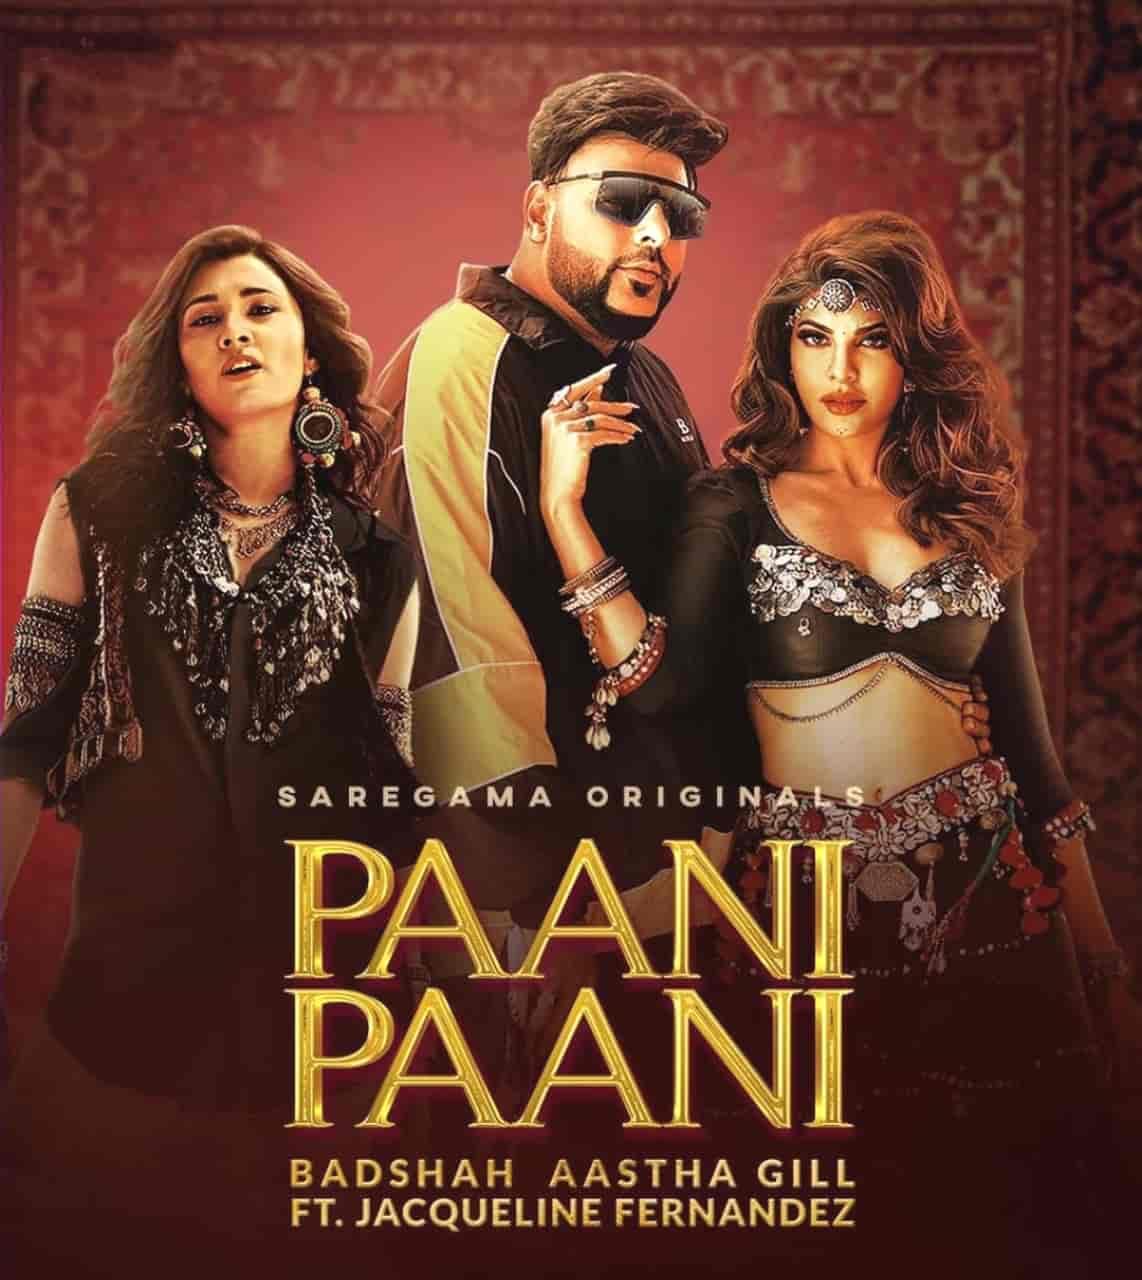 Paani Paani Rap Song Lyrics Badshah Ft. Jacqueline Fernandes